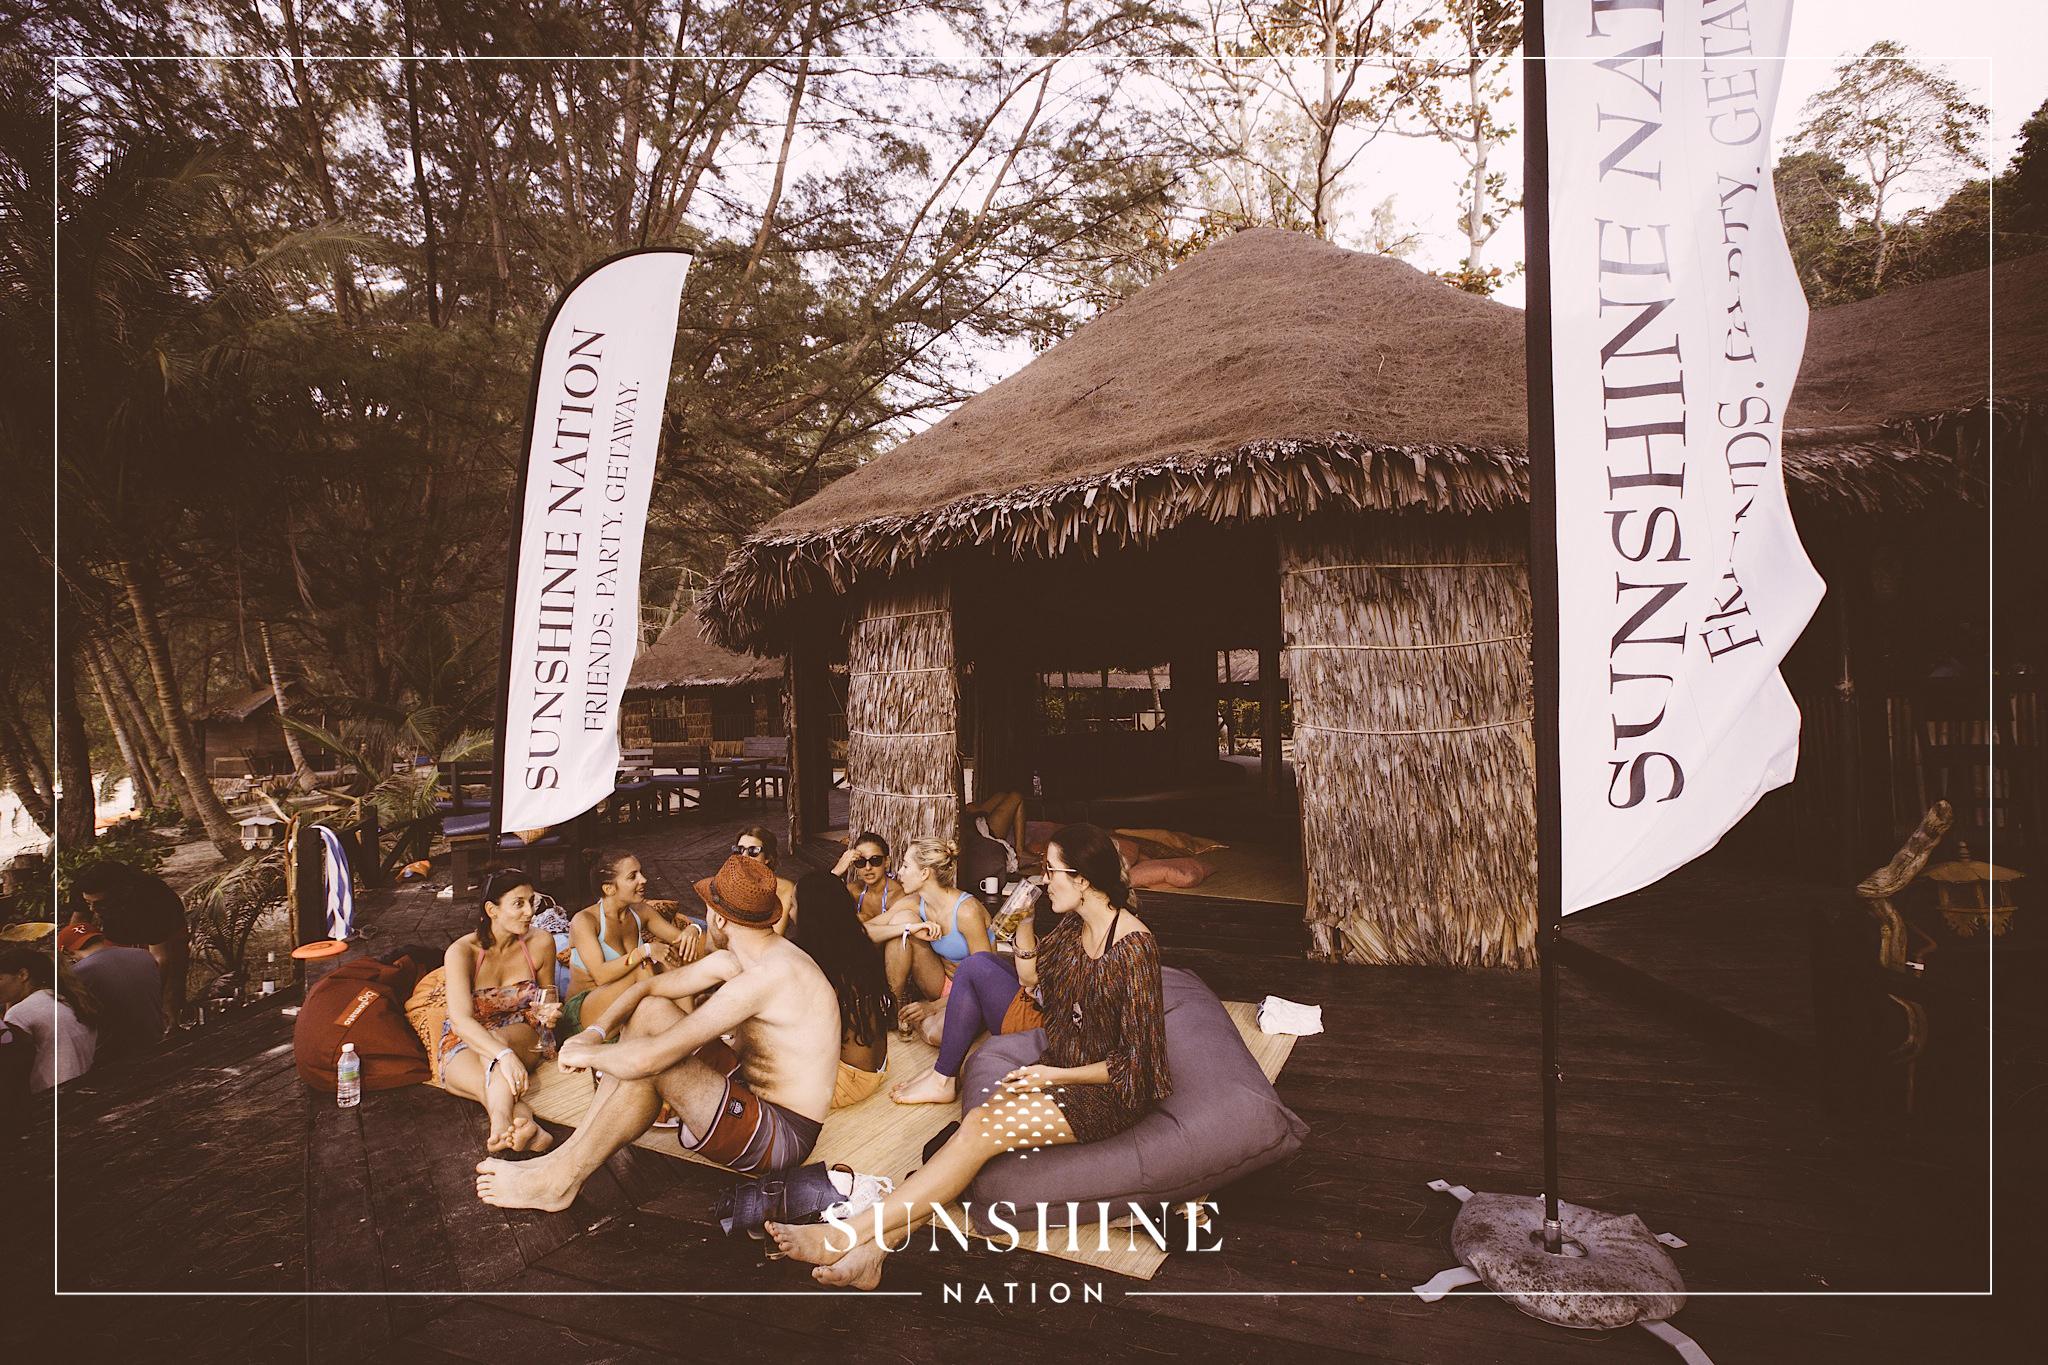 Sunshine Nation Island Takeover 2014 (Photo credits: Colossal Photos)